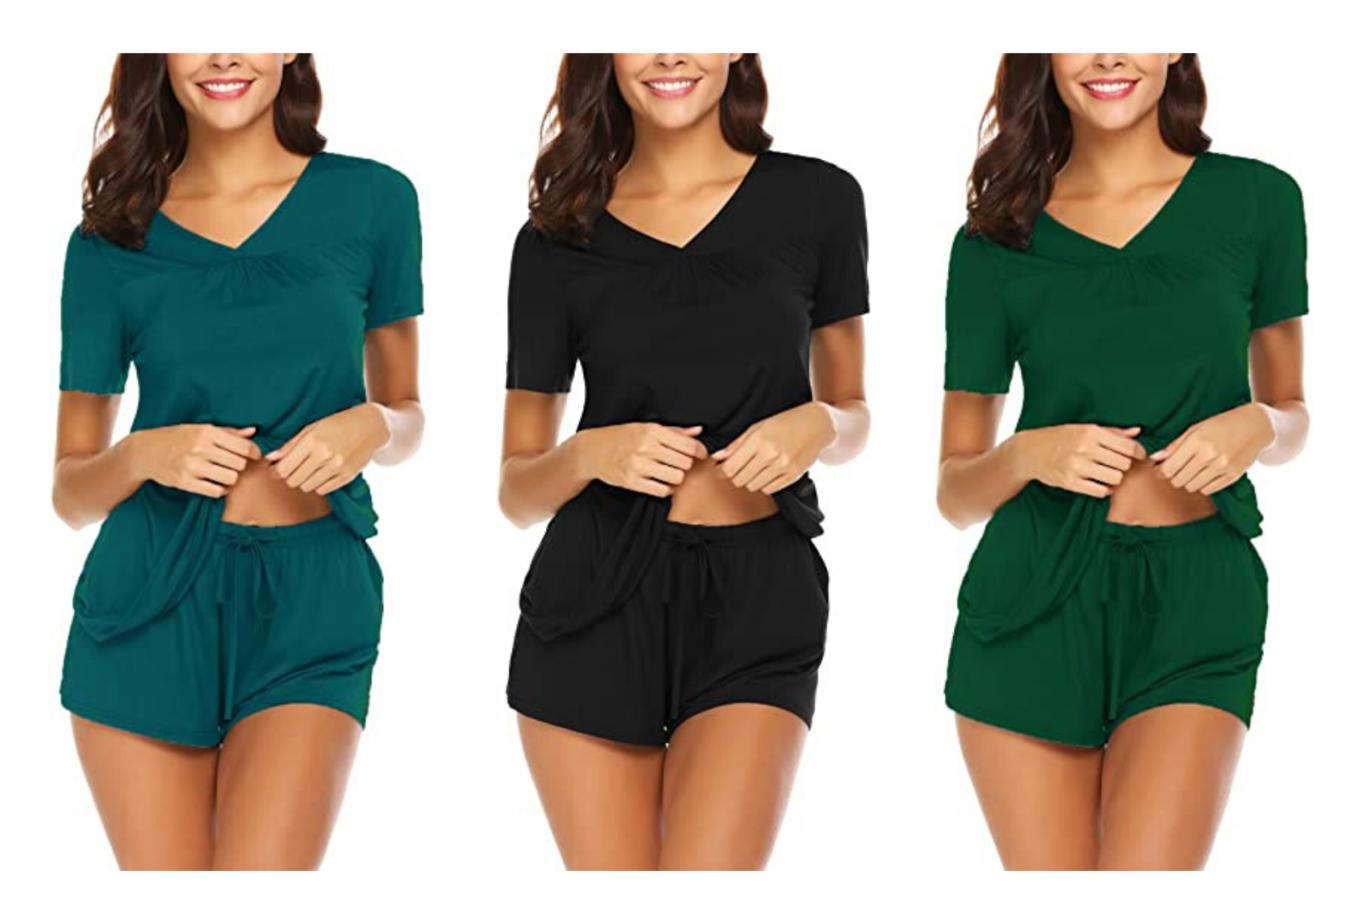 amazon loungewear shorts set